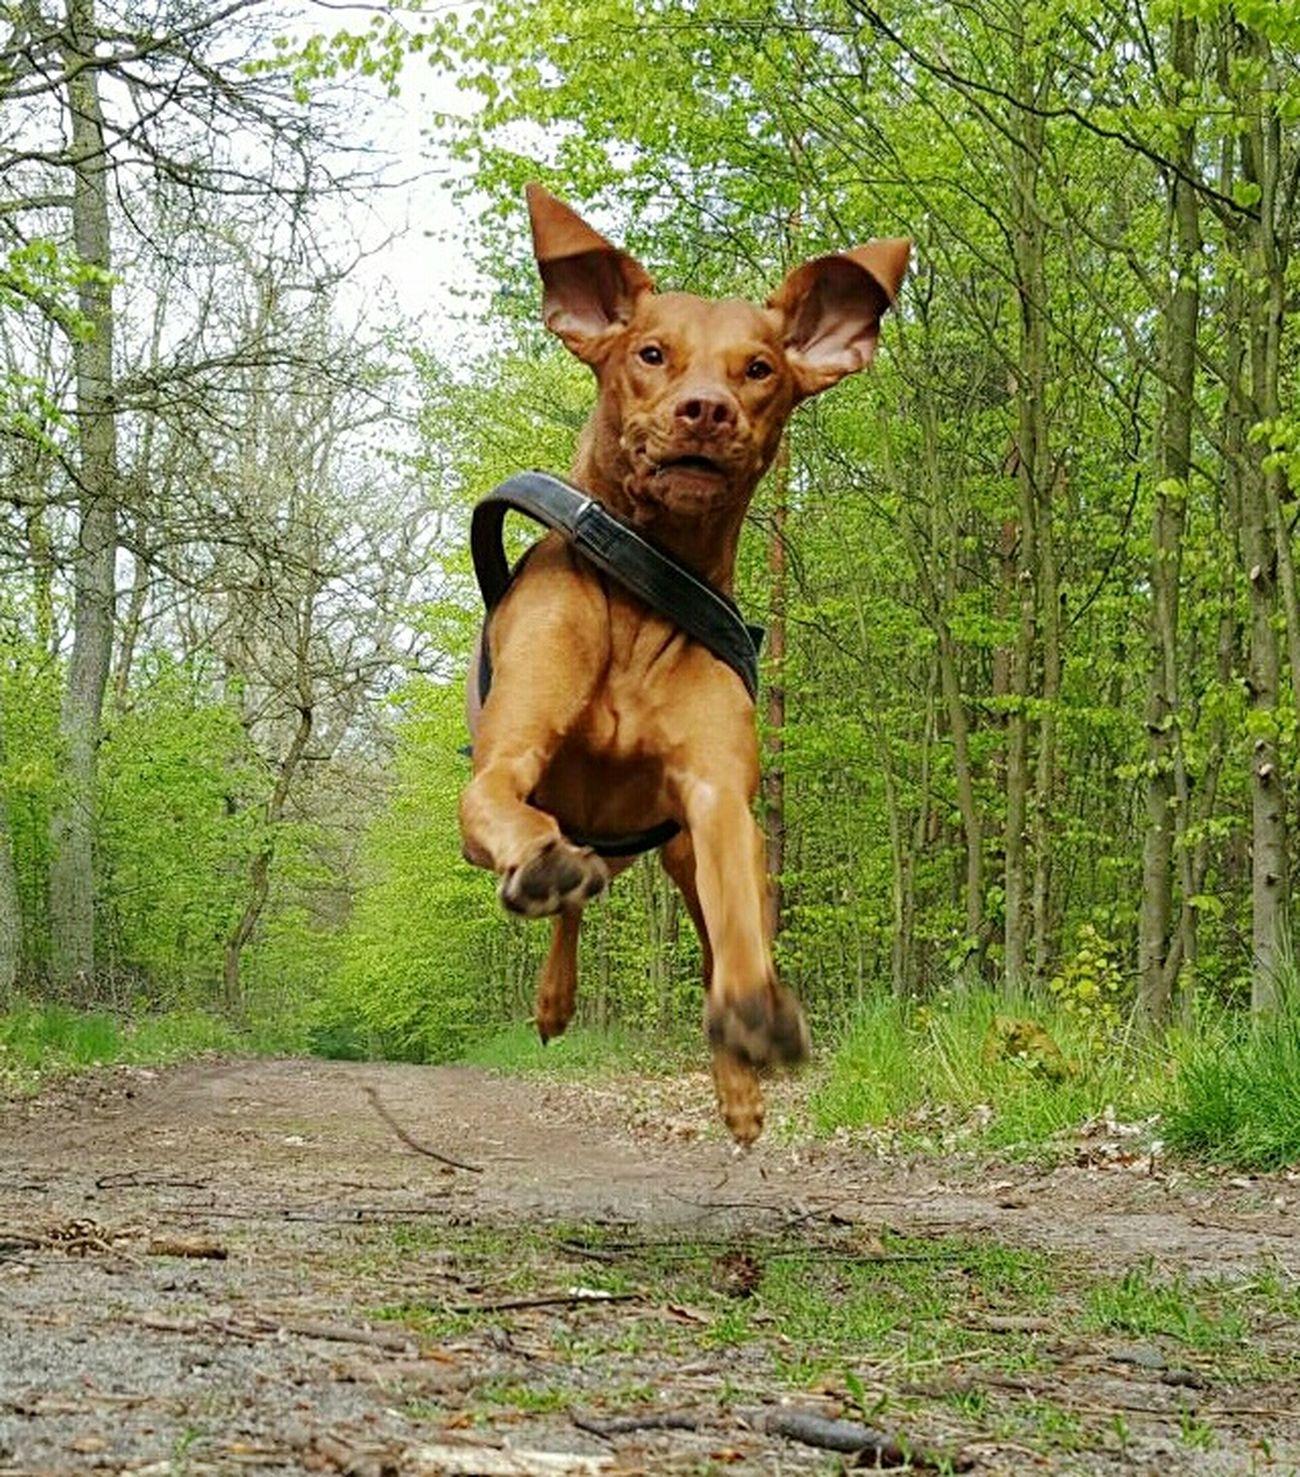 Dog One Animal Hungarianvizsla Best Of EyeEm Shots Ijuma Von Terra Lebusana Vizslalife Bestoftheday Magyar Vizsla Vizslasofinstagram Vizslaoftheday Hunting Dog Running Dog Flying Dog